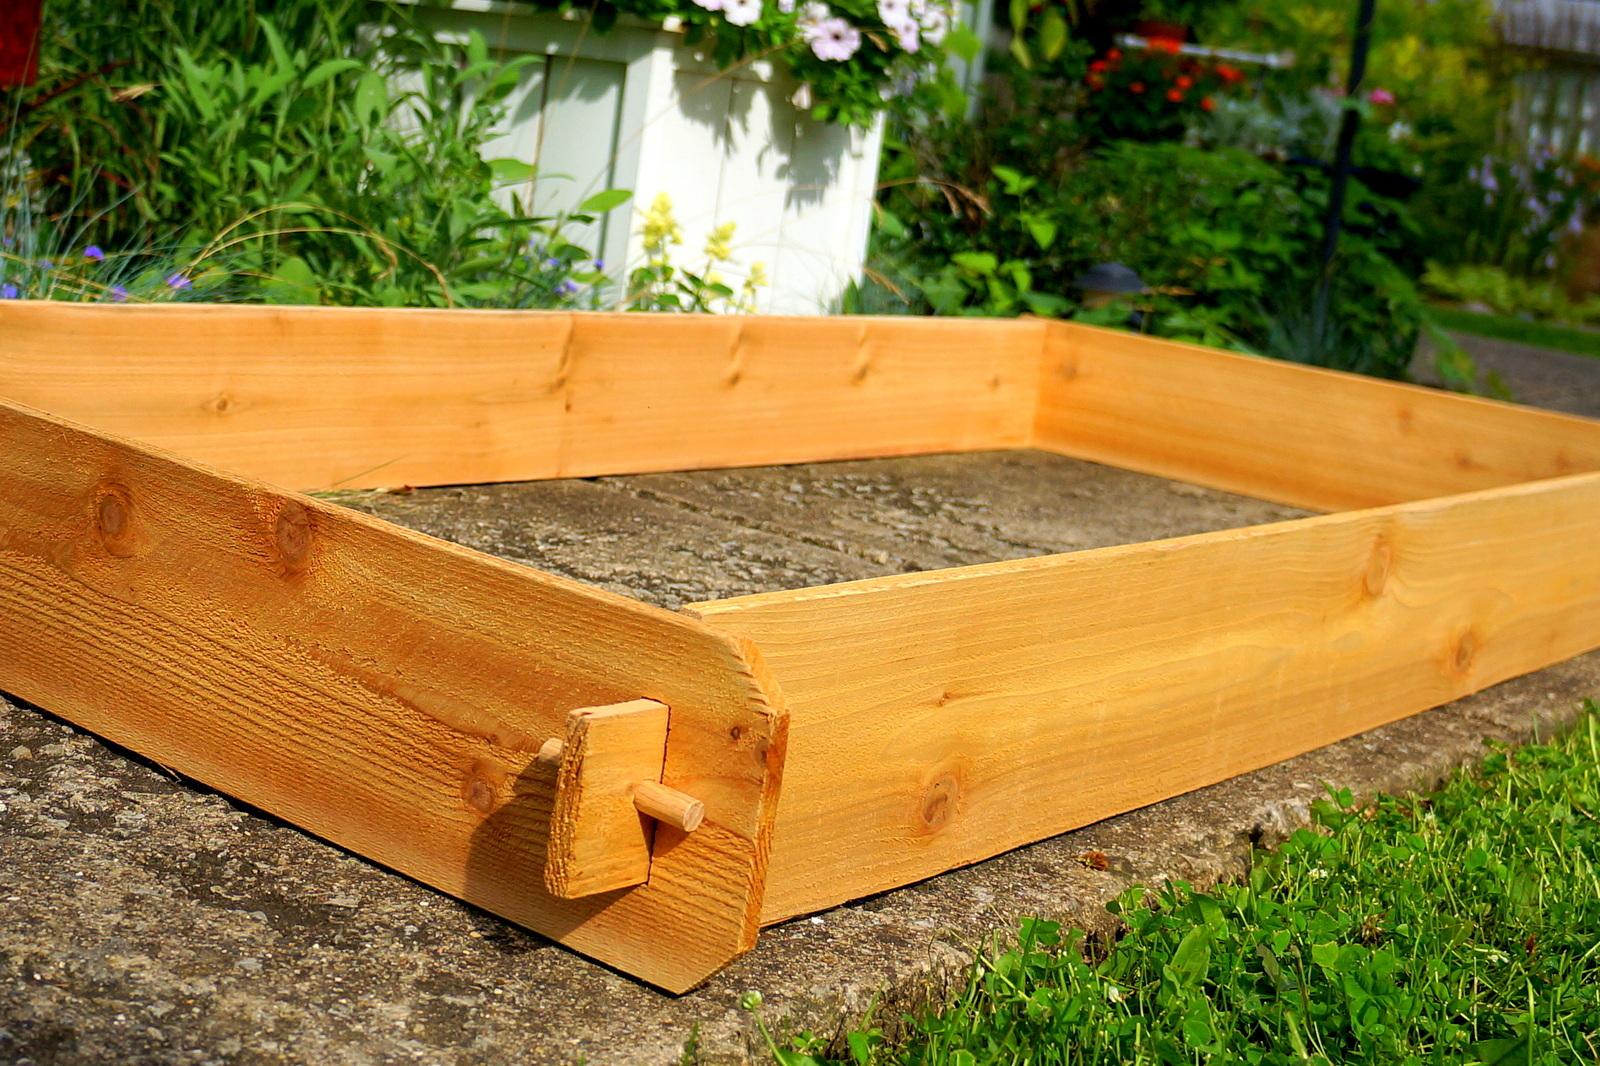 Herb Planter Box Outdoor: Garden Raised Bed Planter Flower Box Cedar Vegetable Kit